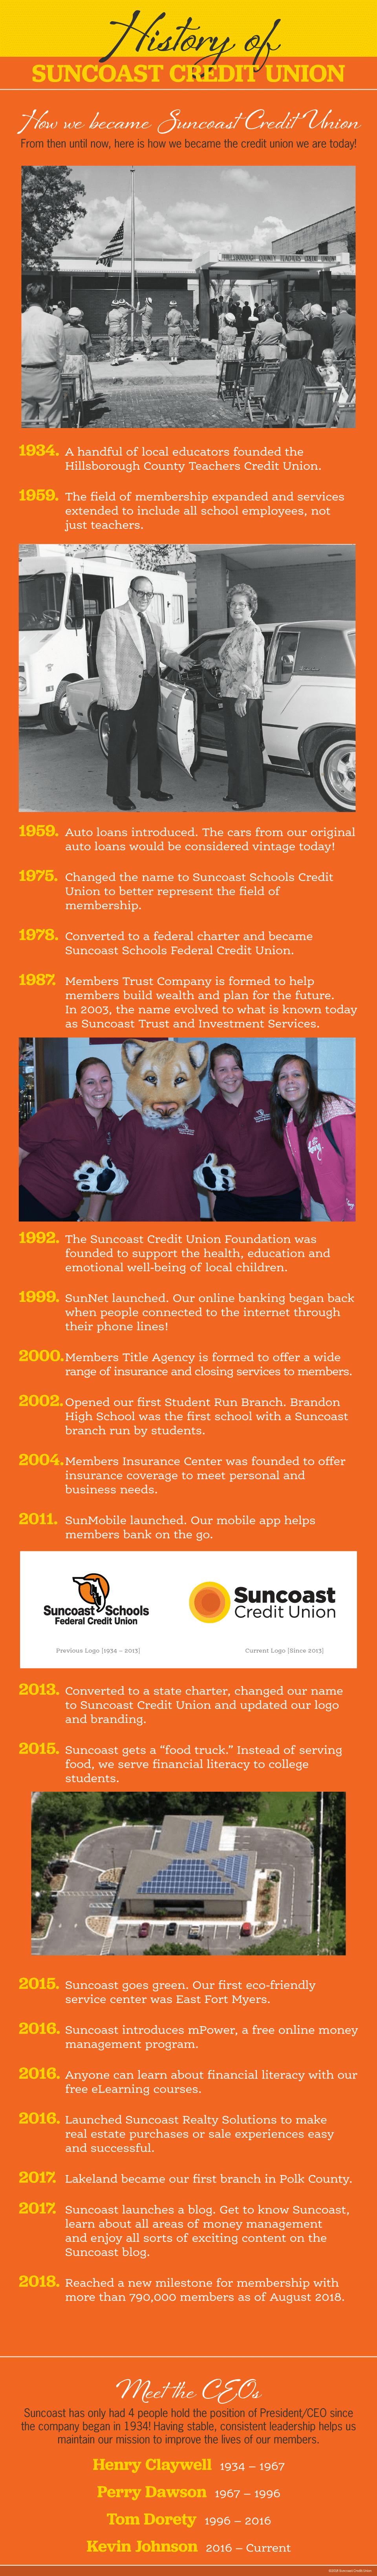 InfografíaLa historia de Suncoast